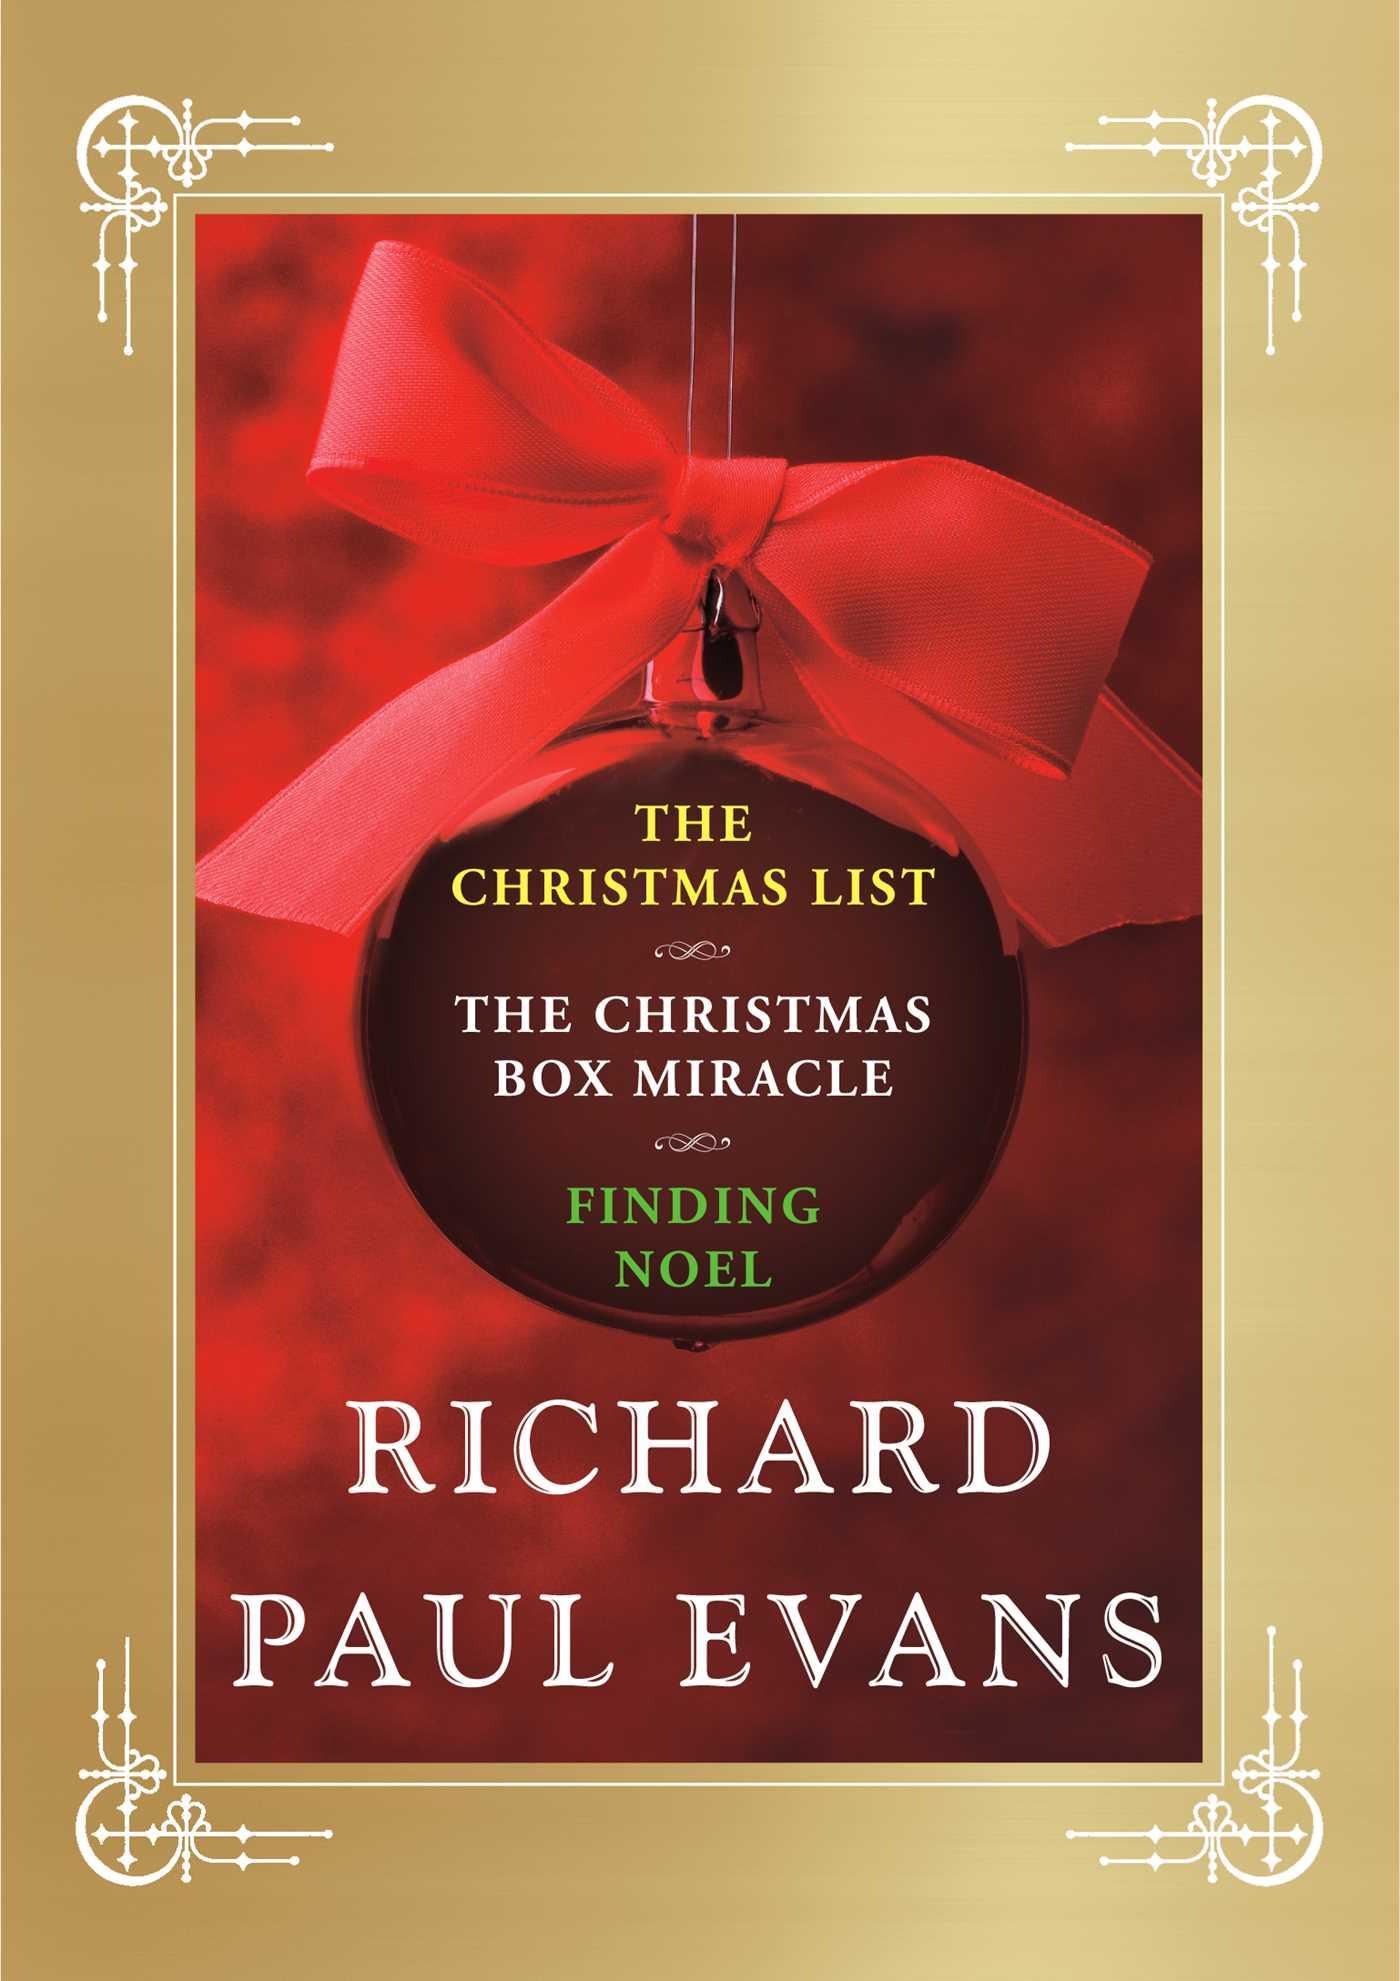 Richard paul evans ebook christmas set 9781451640144 hr